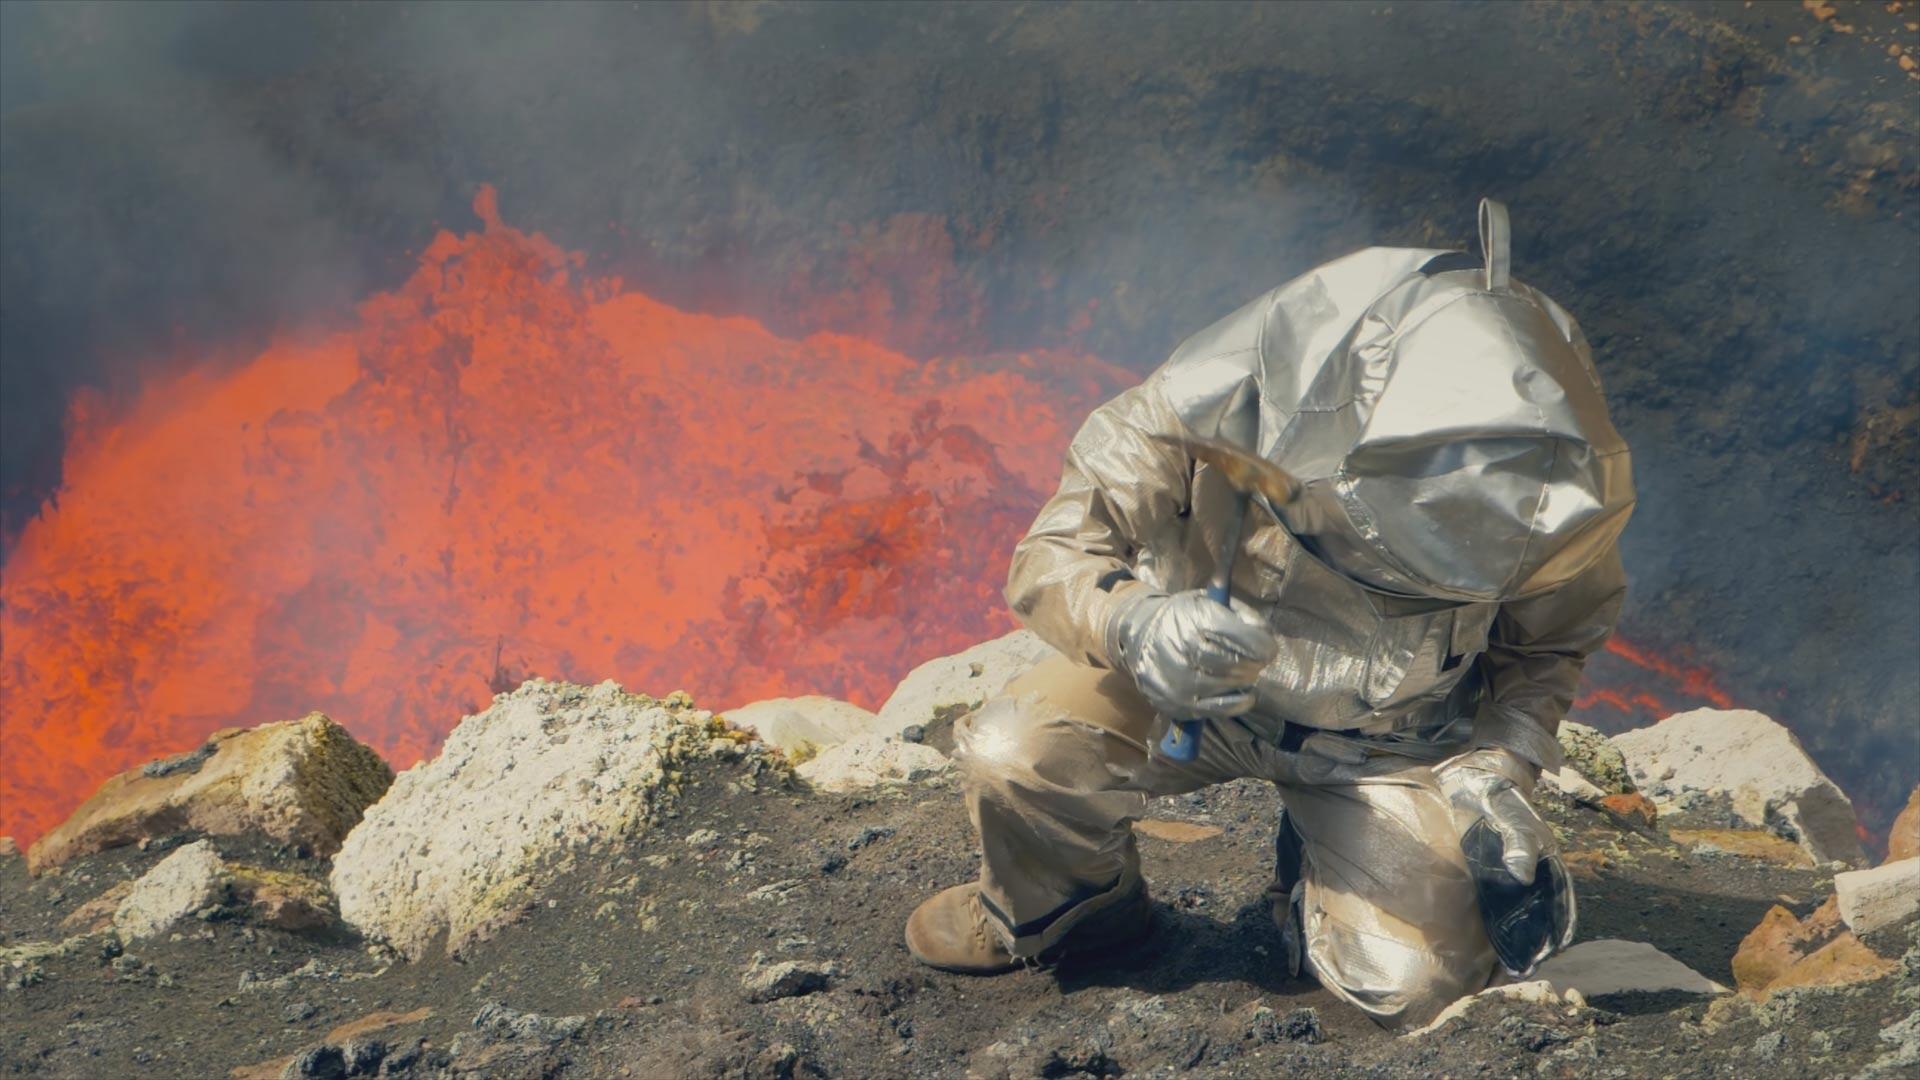 Scientist Dr. Jeffrey Marlow takes samples with the bubbling lava lake of Marum, Vanuatu behind him.